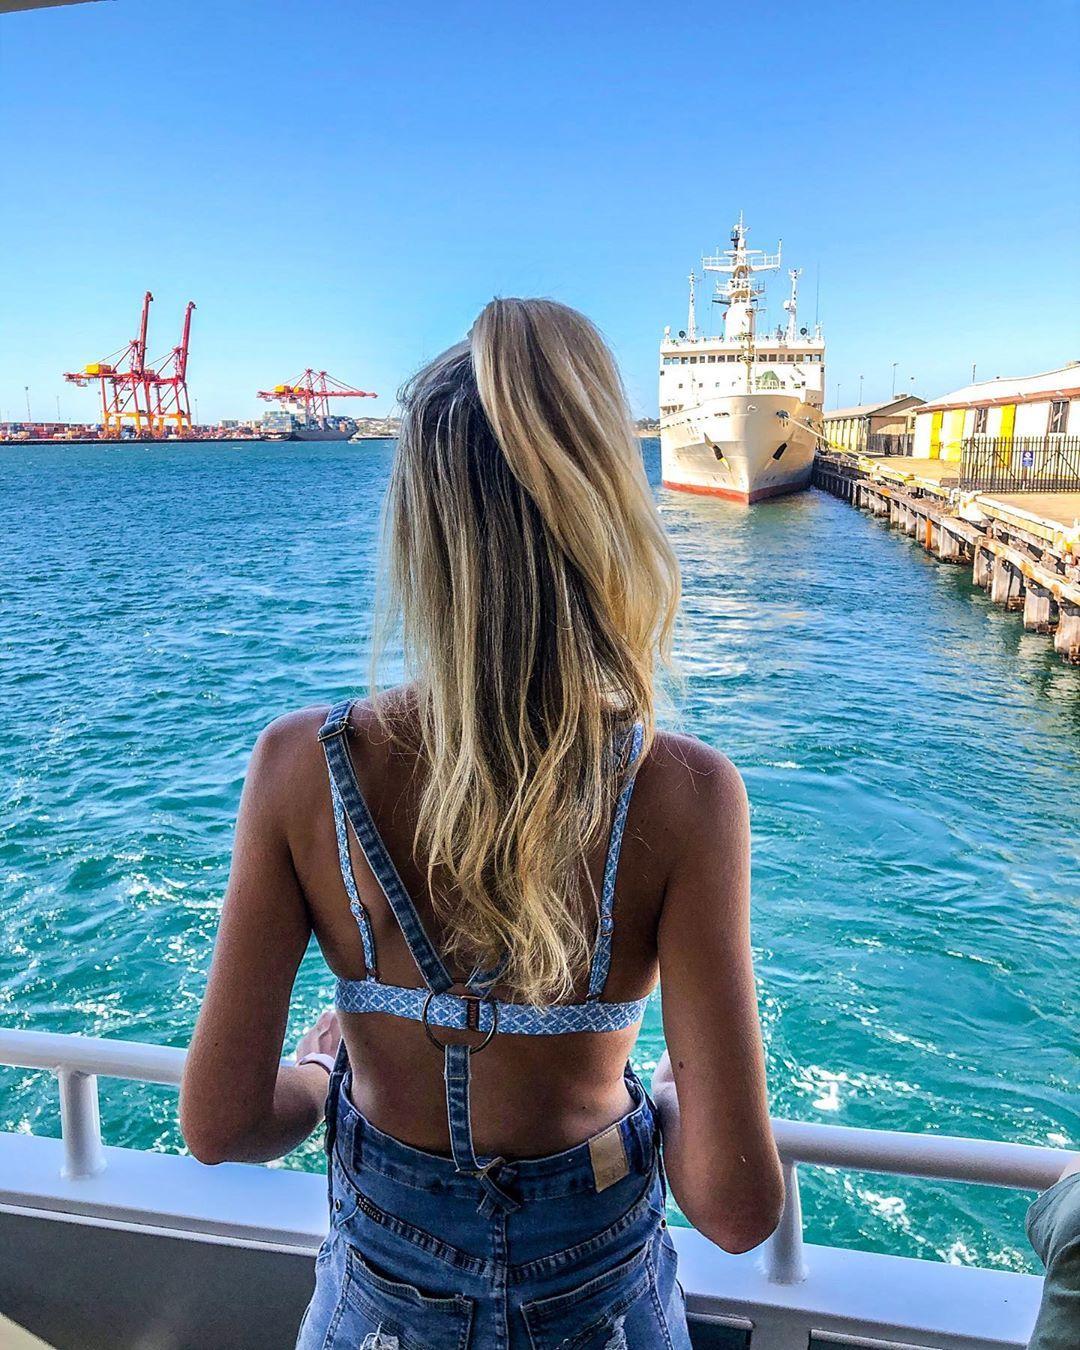 lina johansson instagram